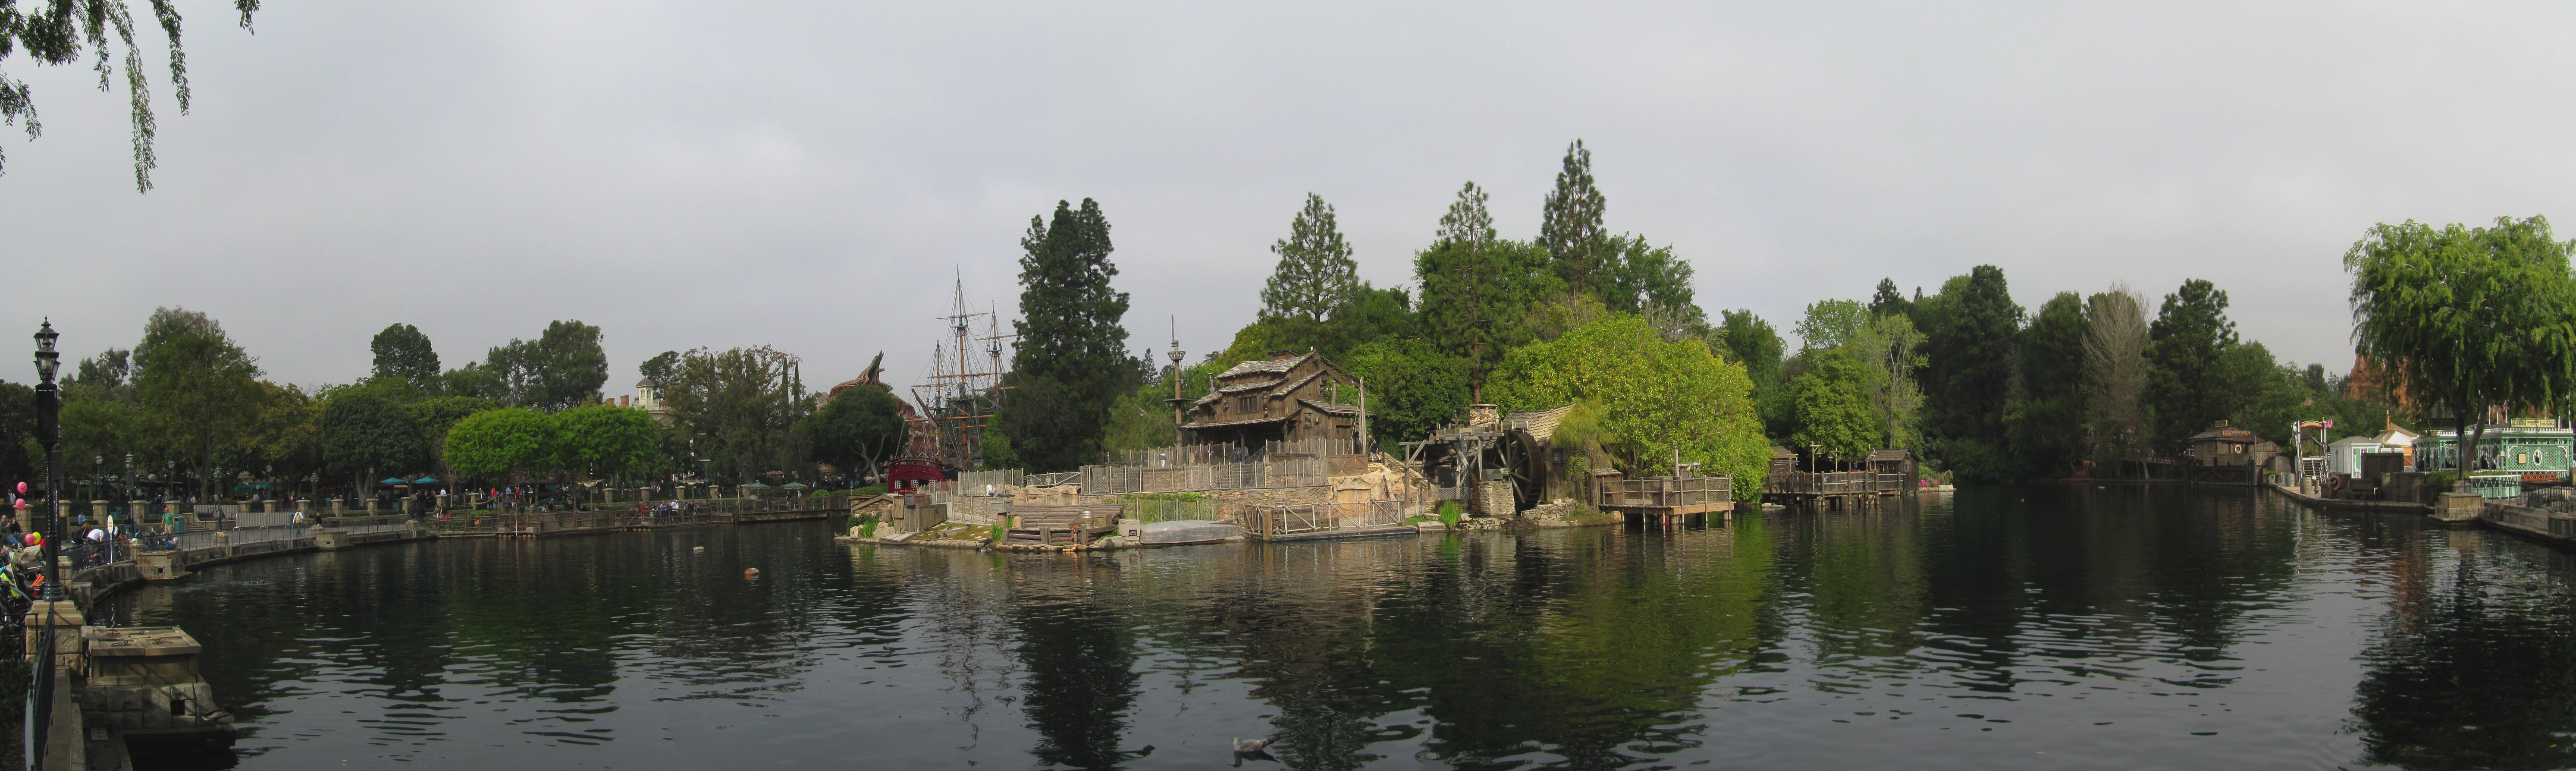 Disneyland Panoramas  JeremyPerson